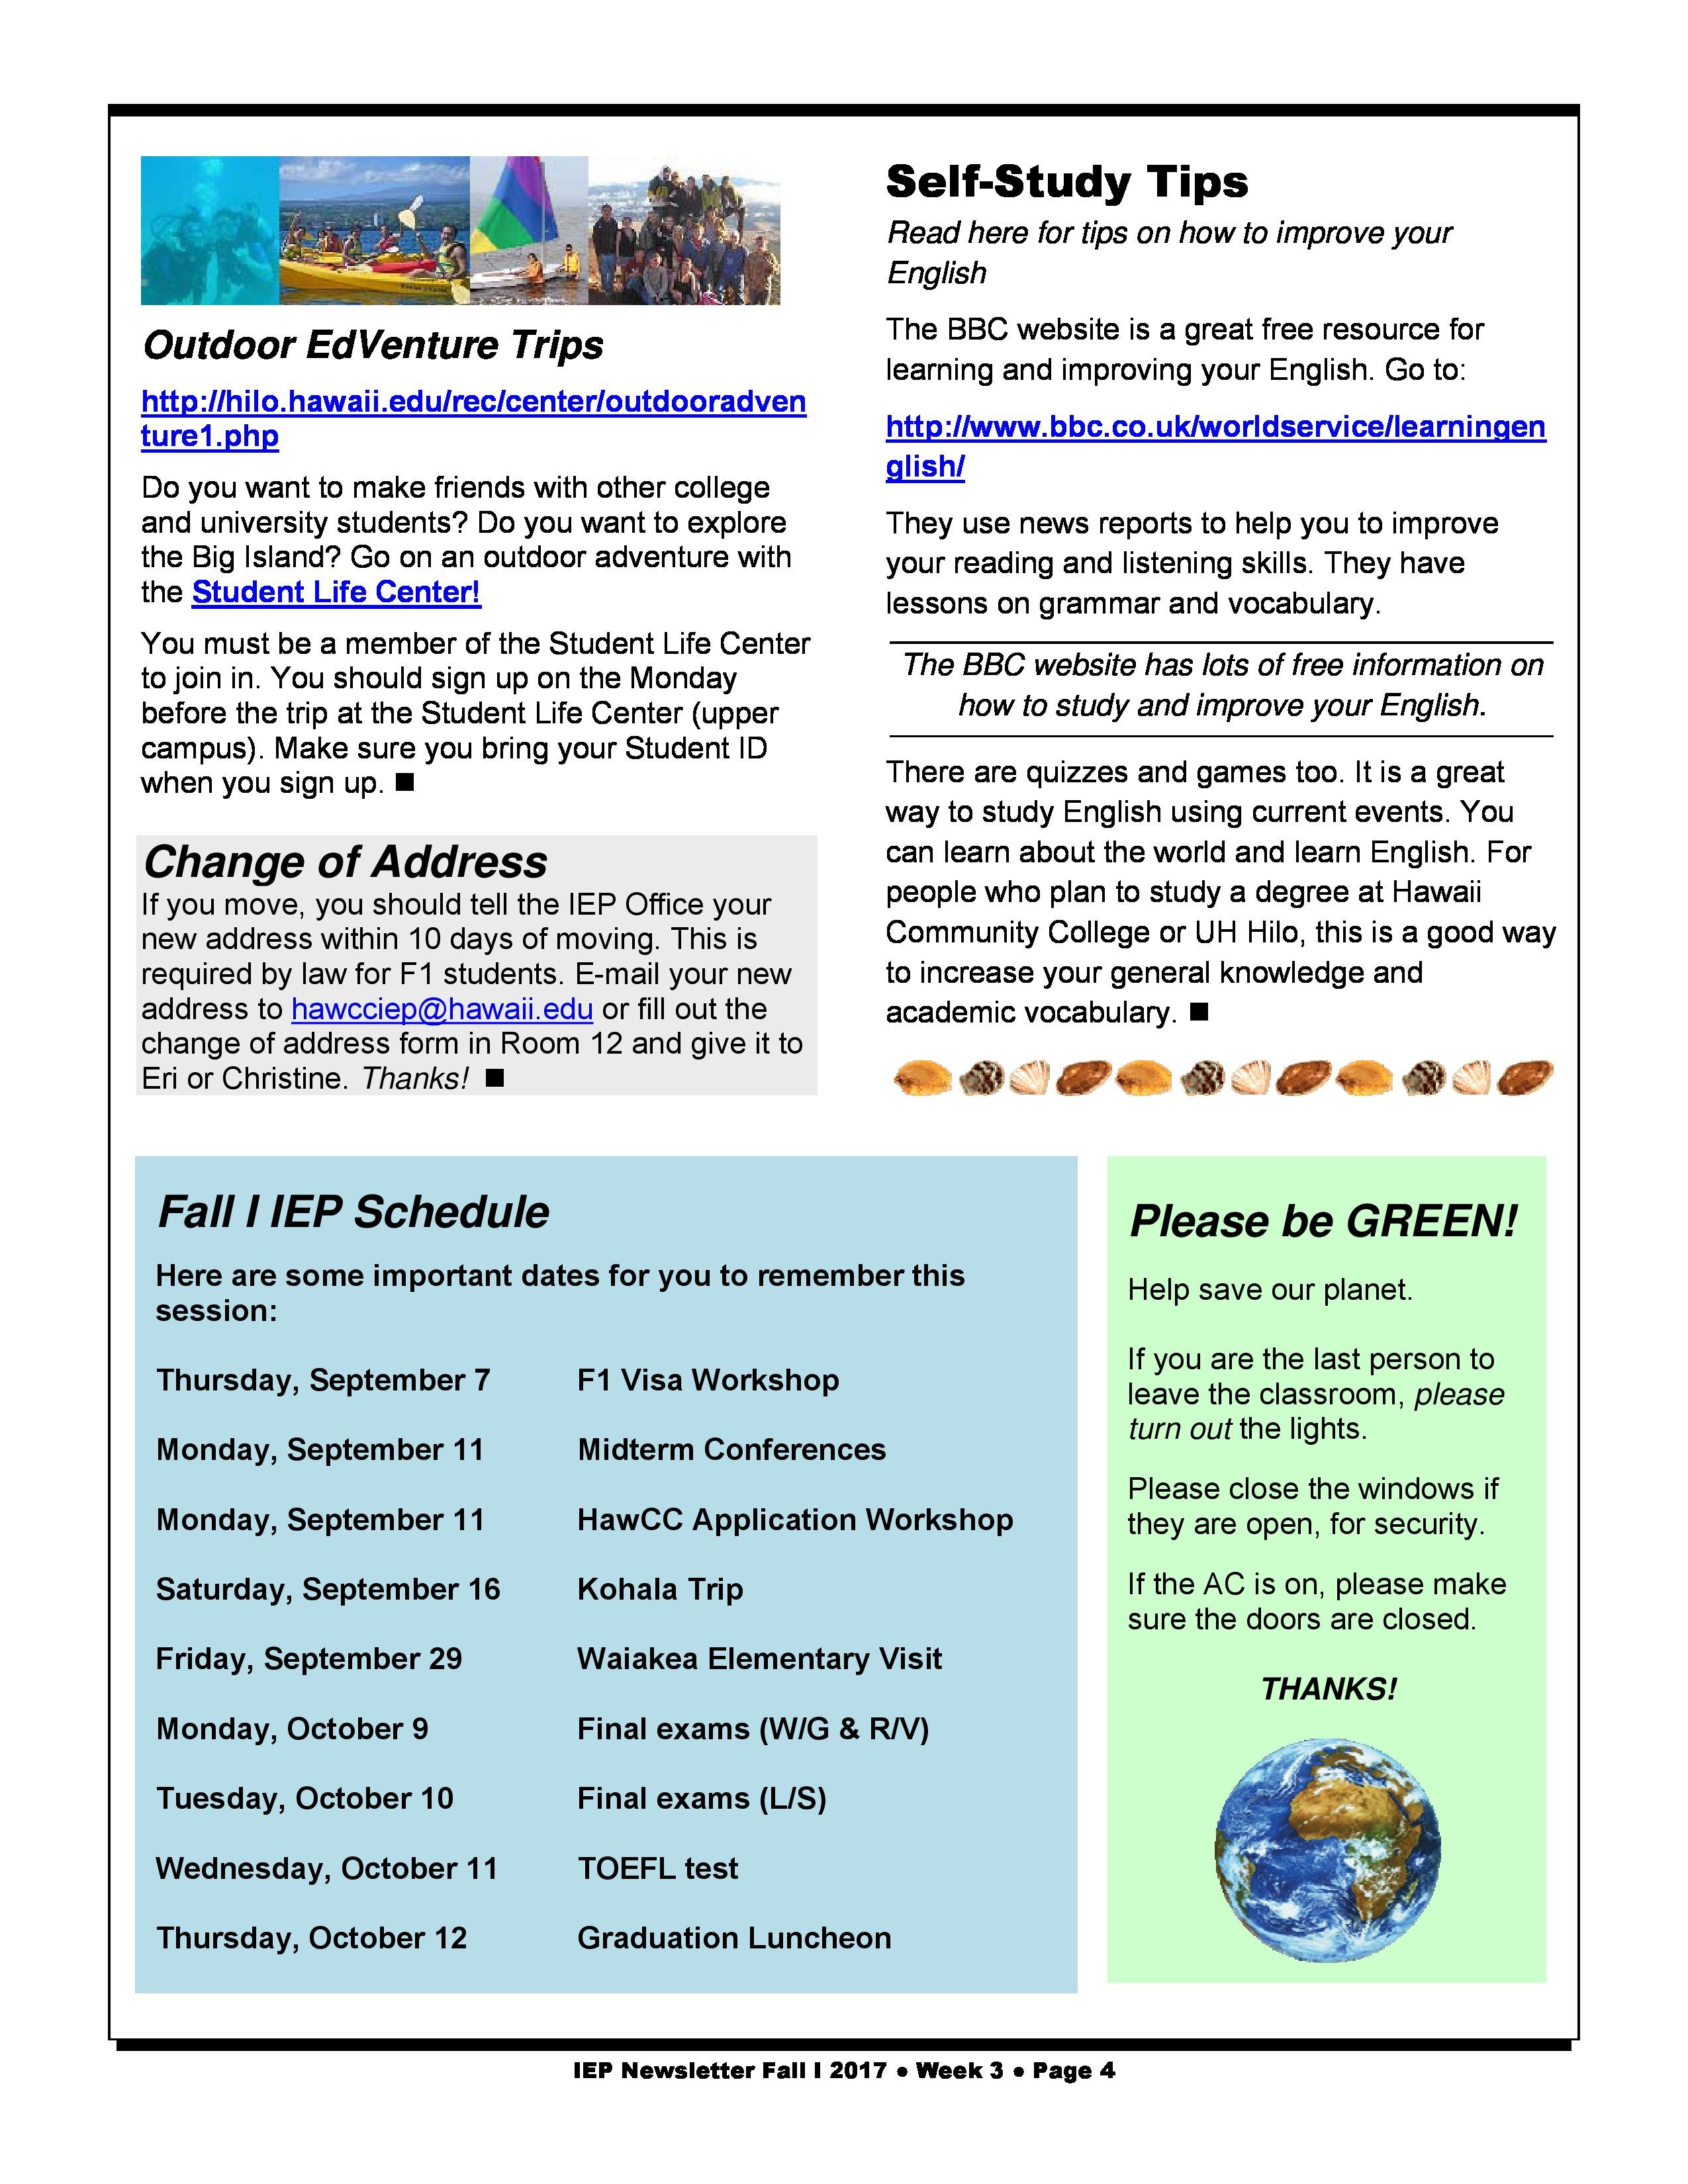 IEP Newsletter Week 3 Fall I 2017 - Intensive English Program - Hawaiʻi Community College